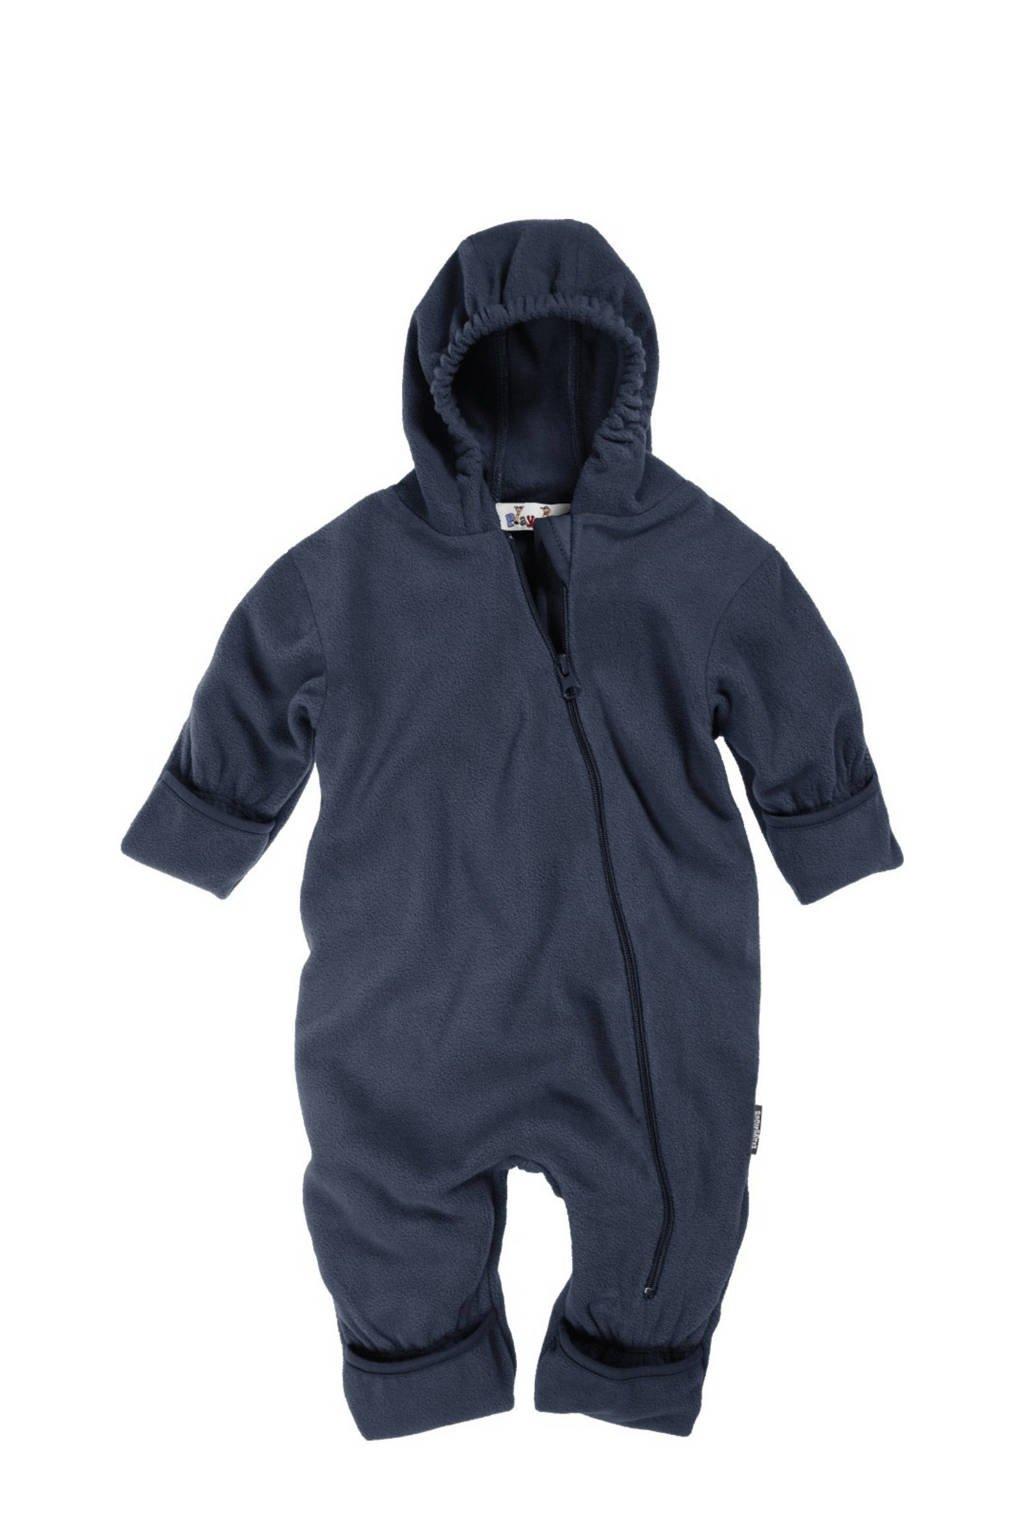 Playshoes baby fleece reversible jas donkerblauw, Donkerblauw